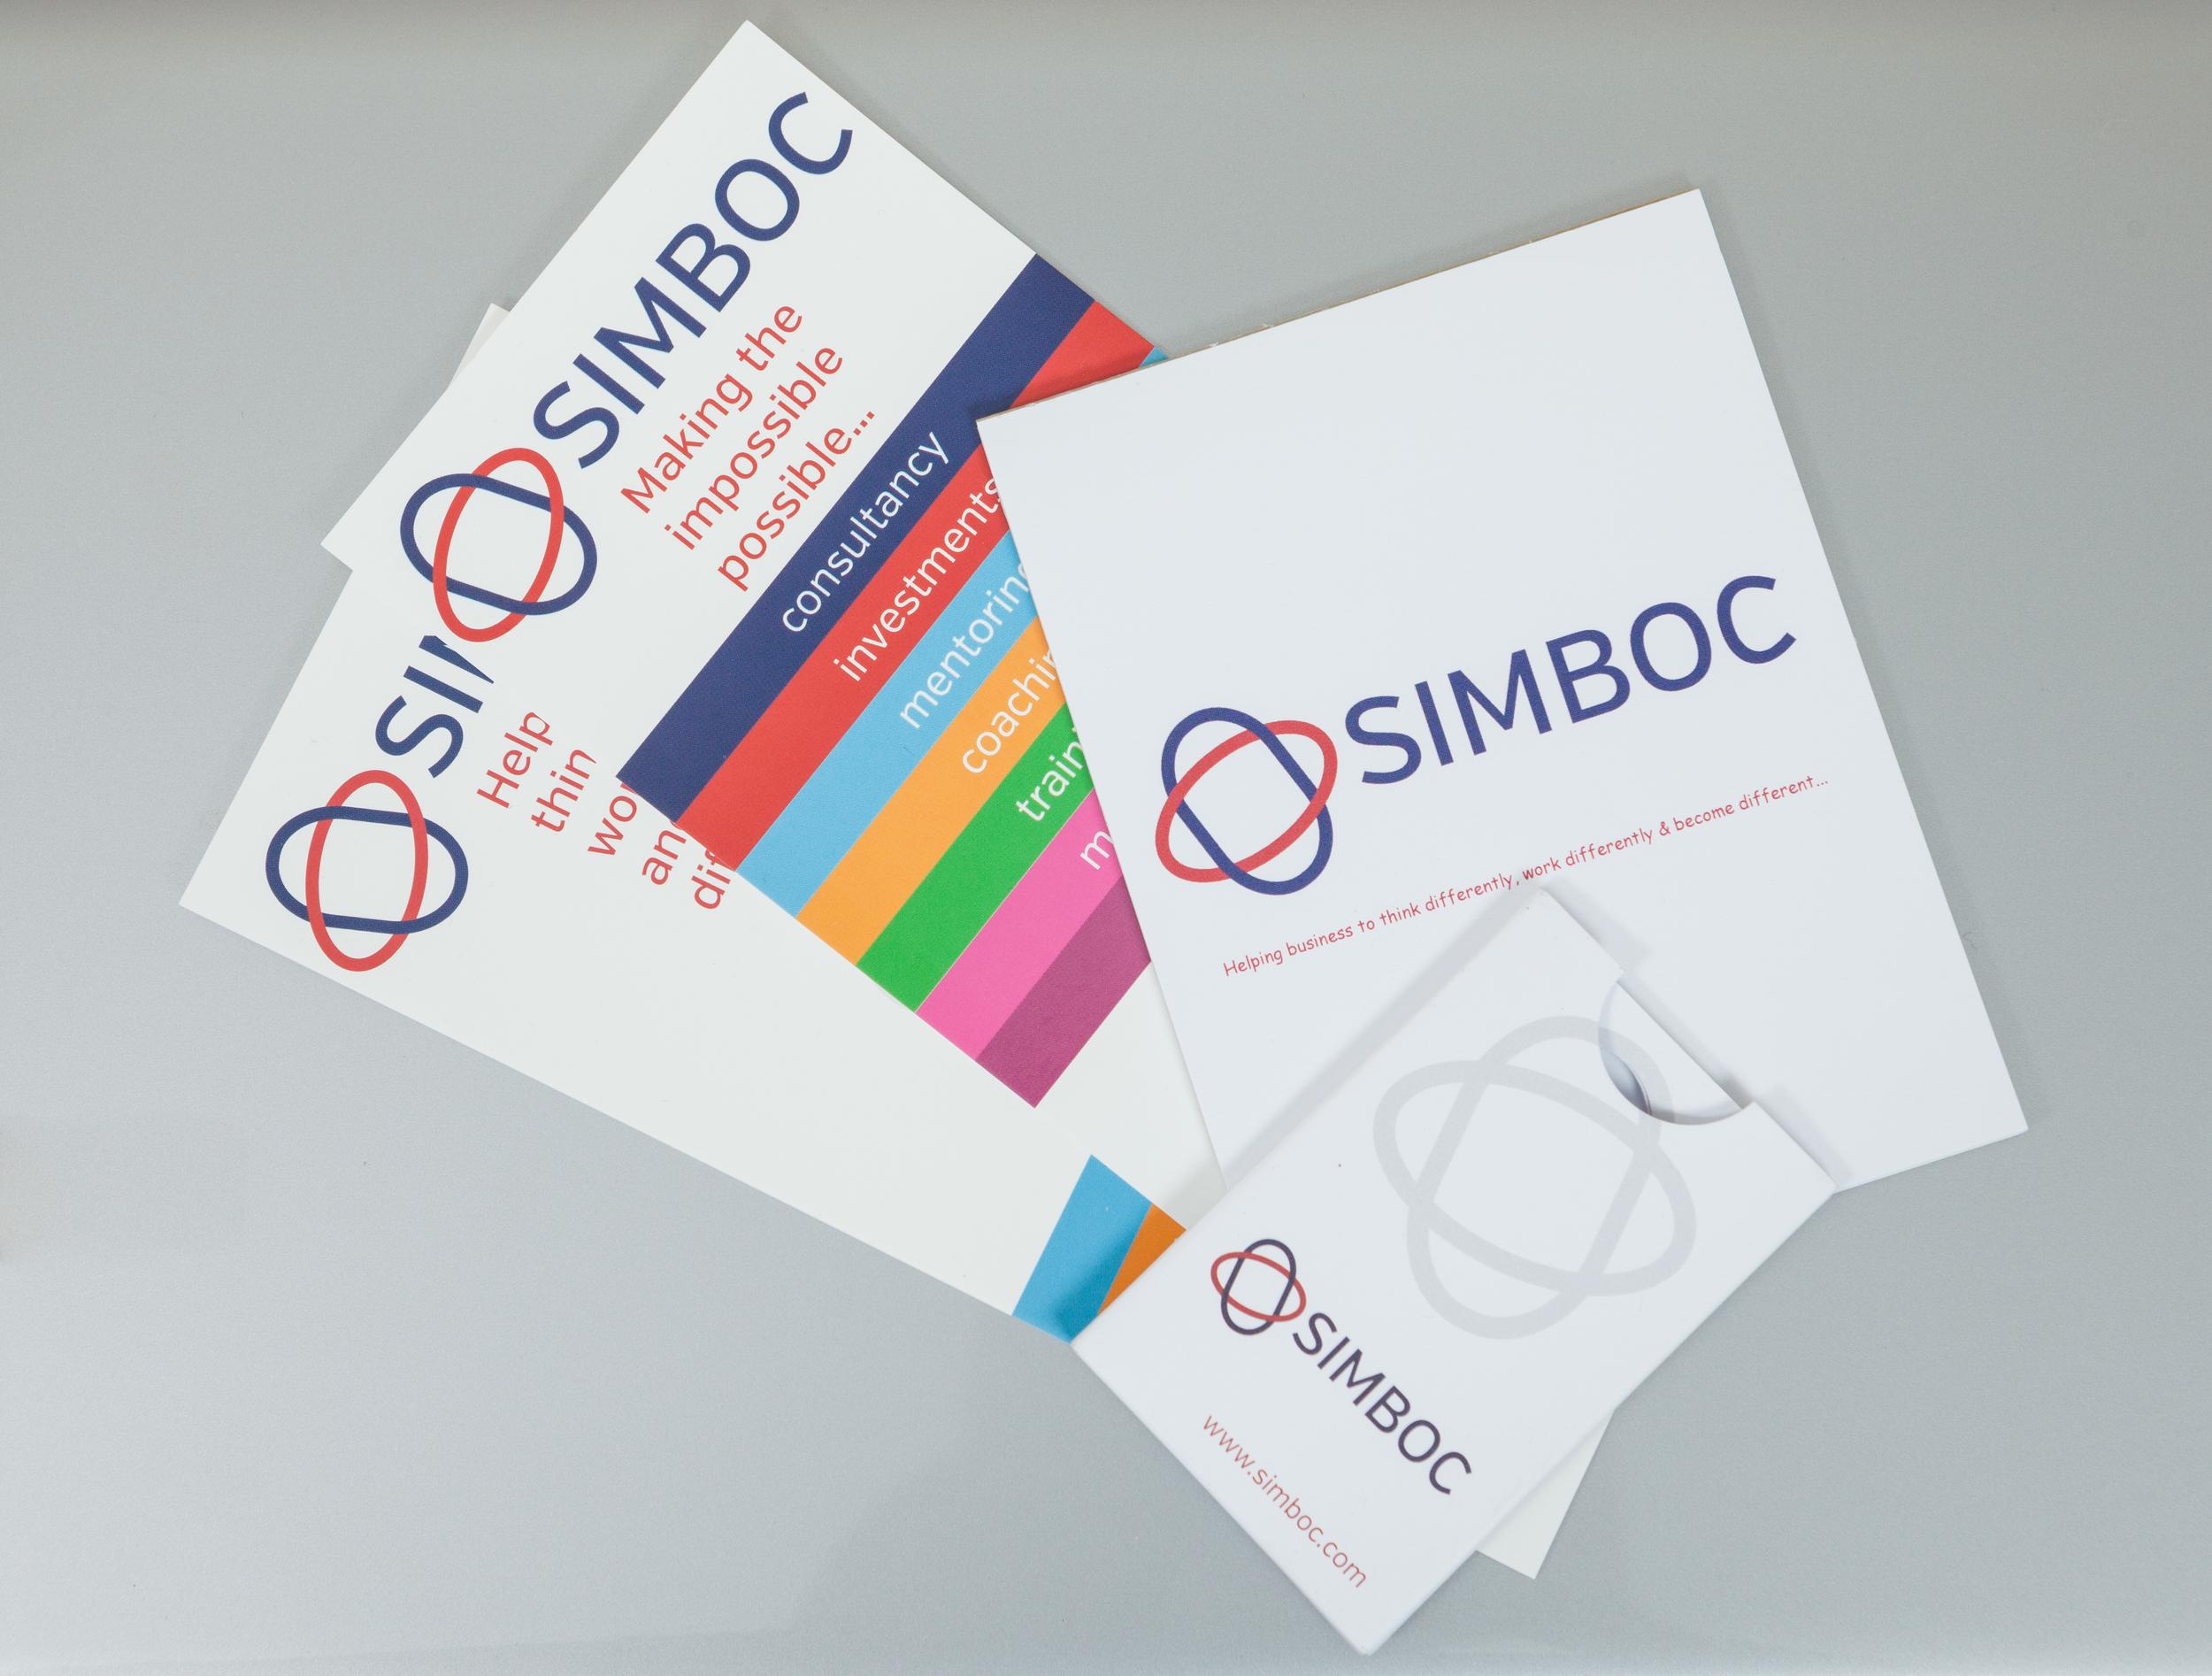 Simboc Leaflets_SimbocLtd_6934.jpg